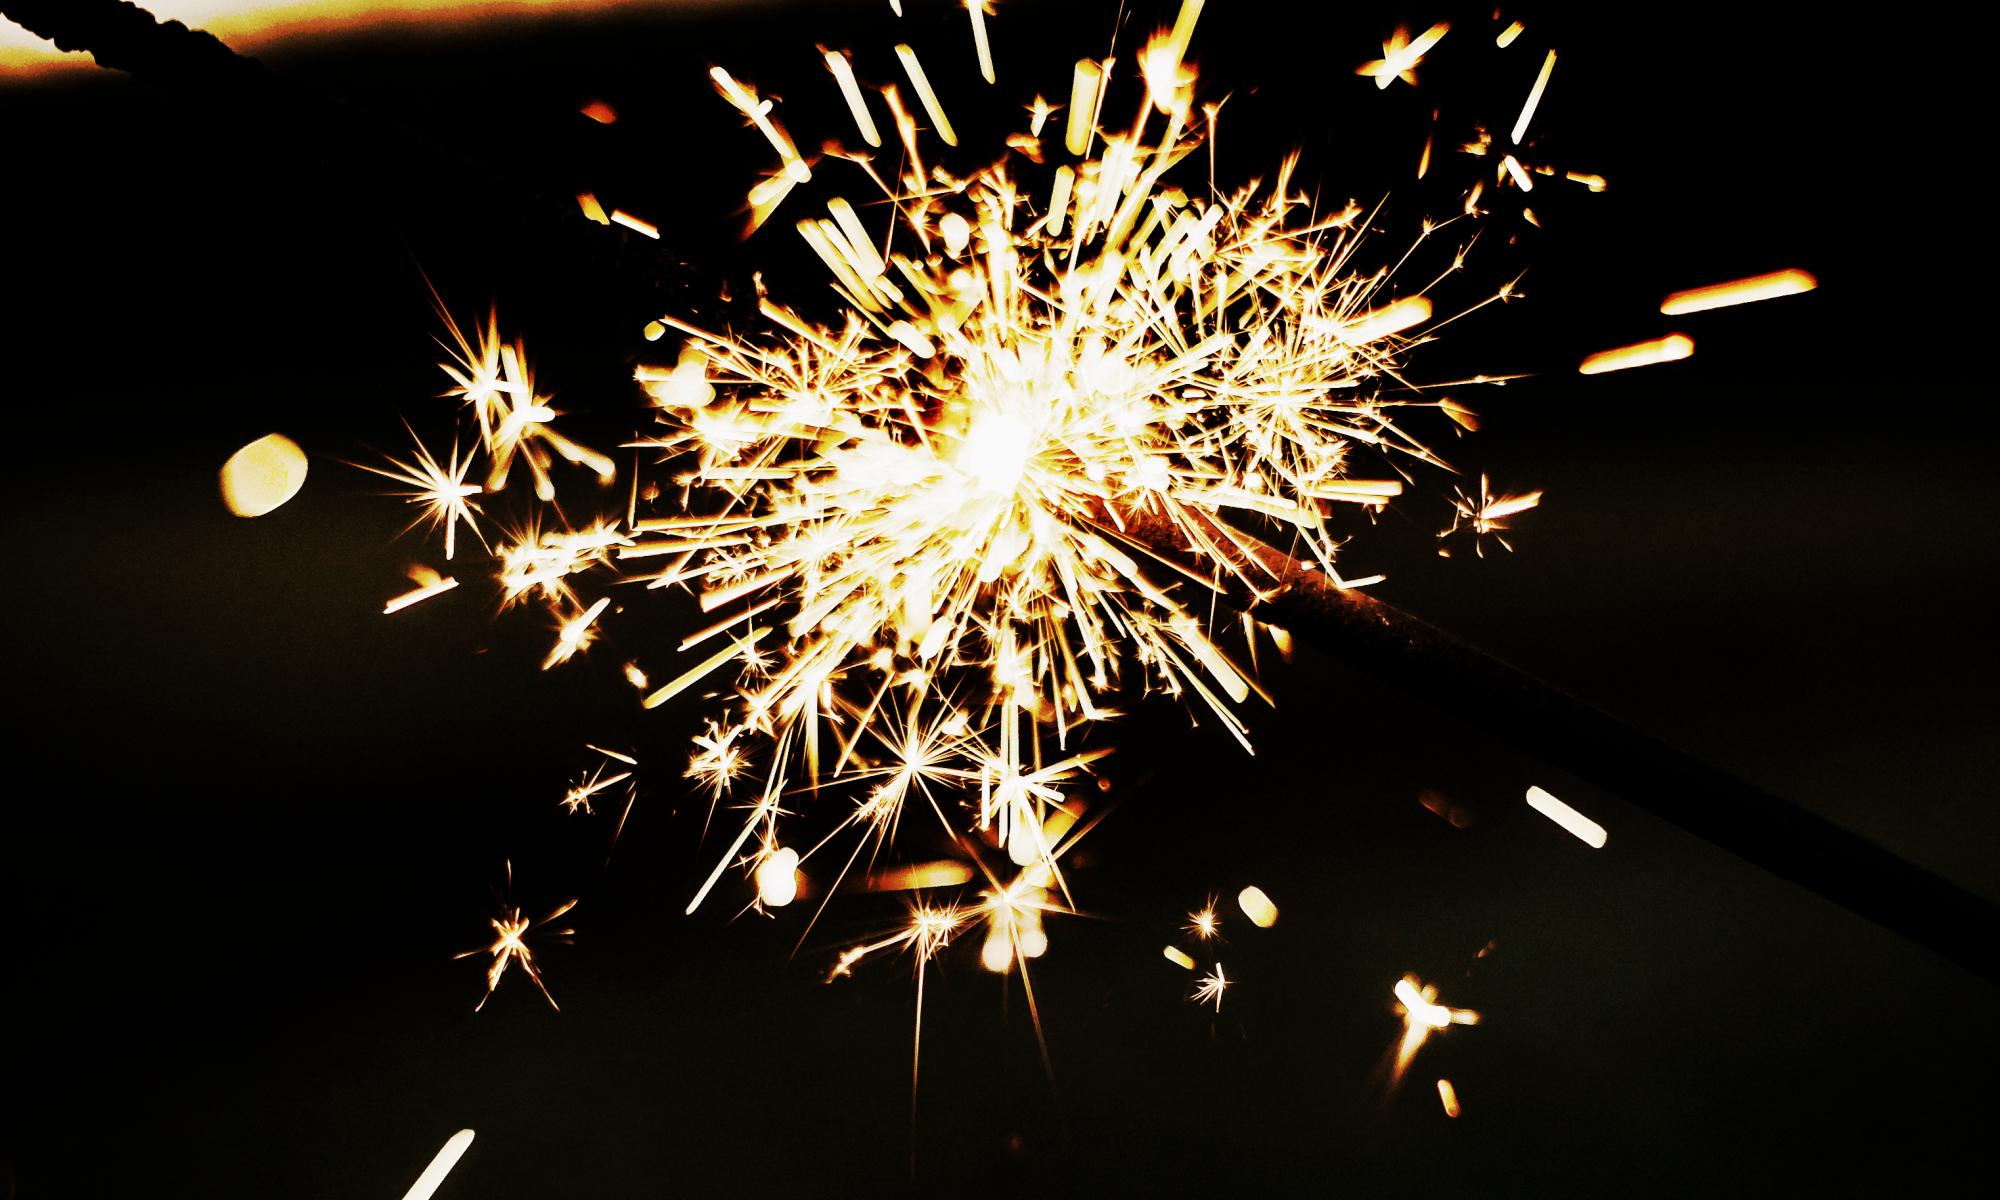 Spark The Flame